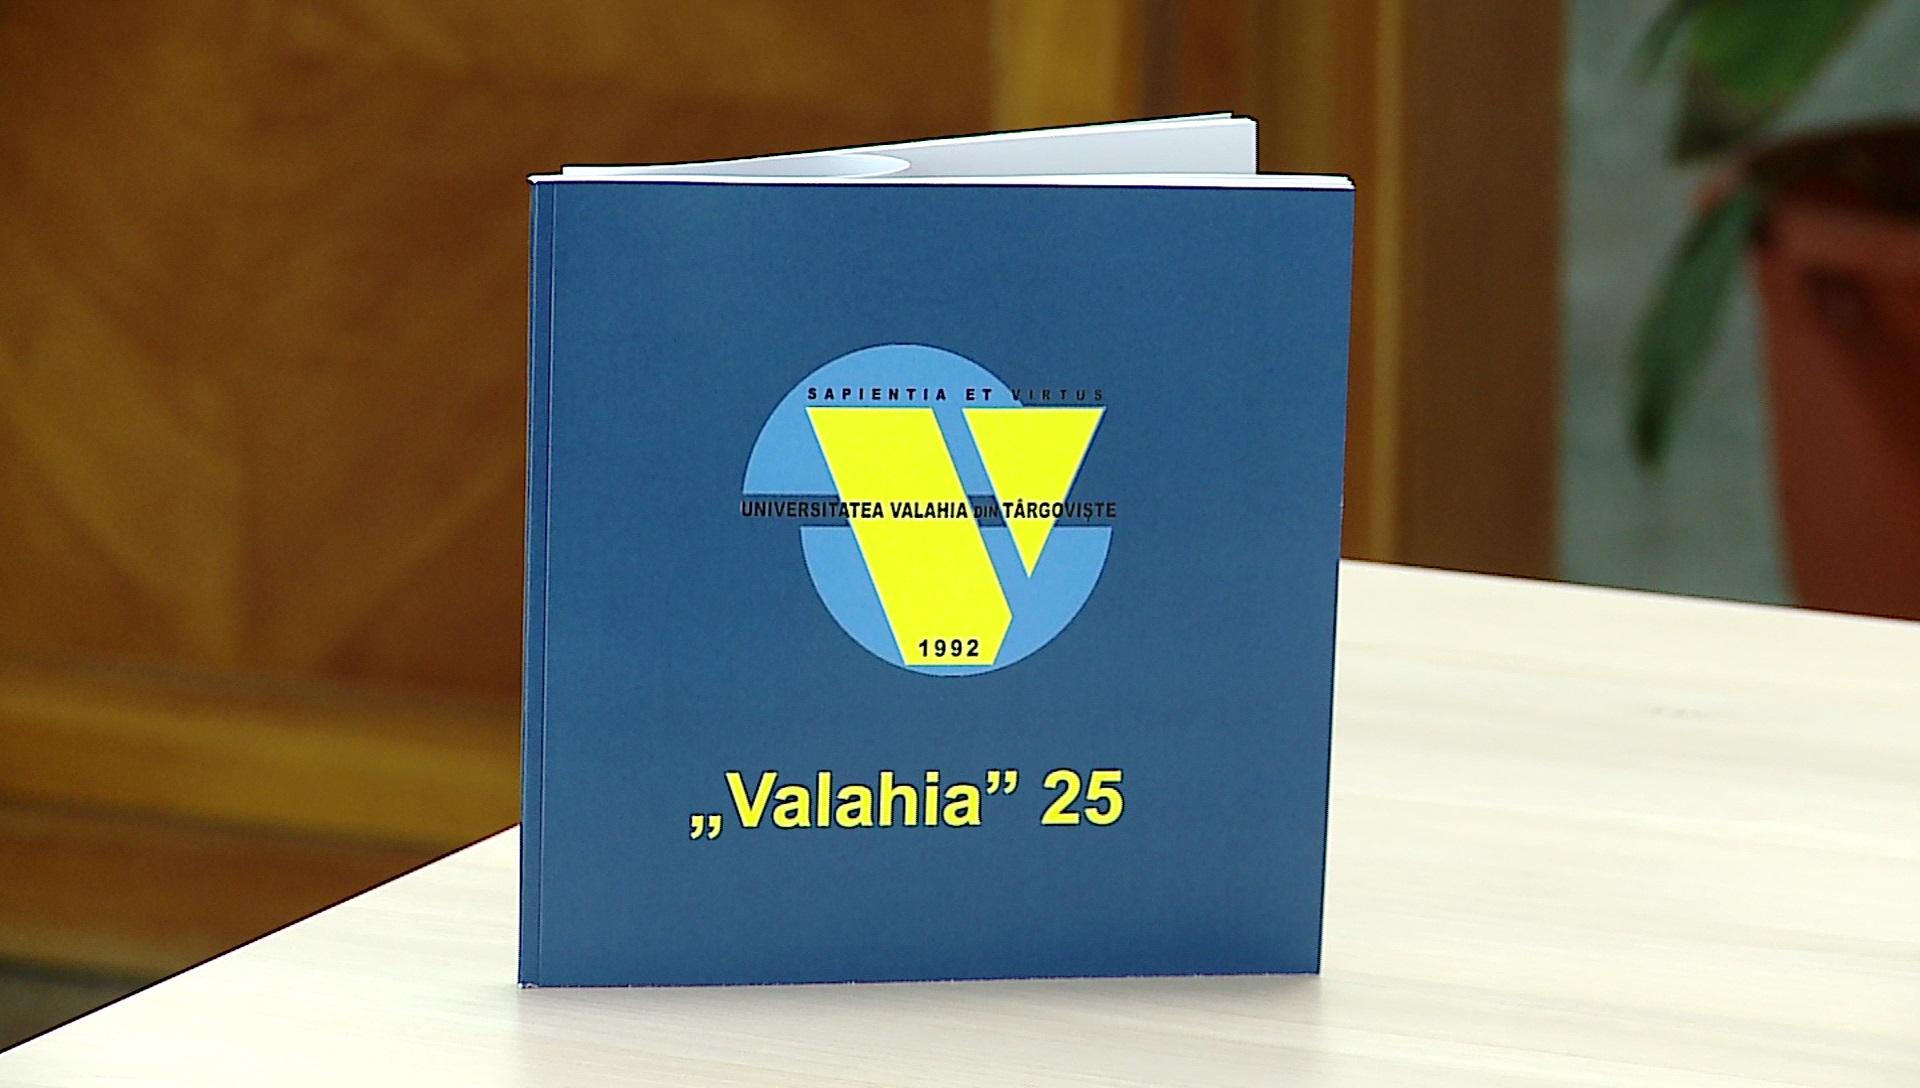 UNIVERSITATEA VALAHIA LA A 25-A ANIVERSARE